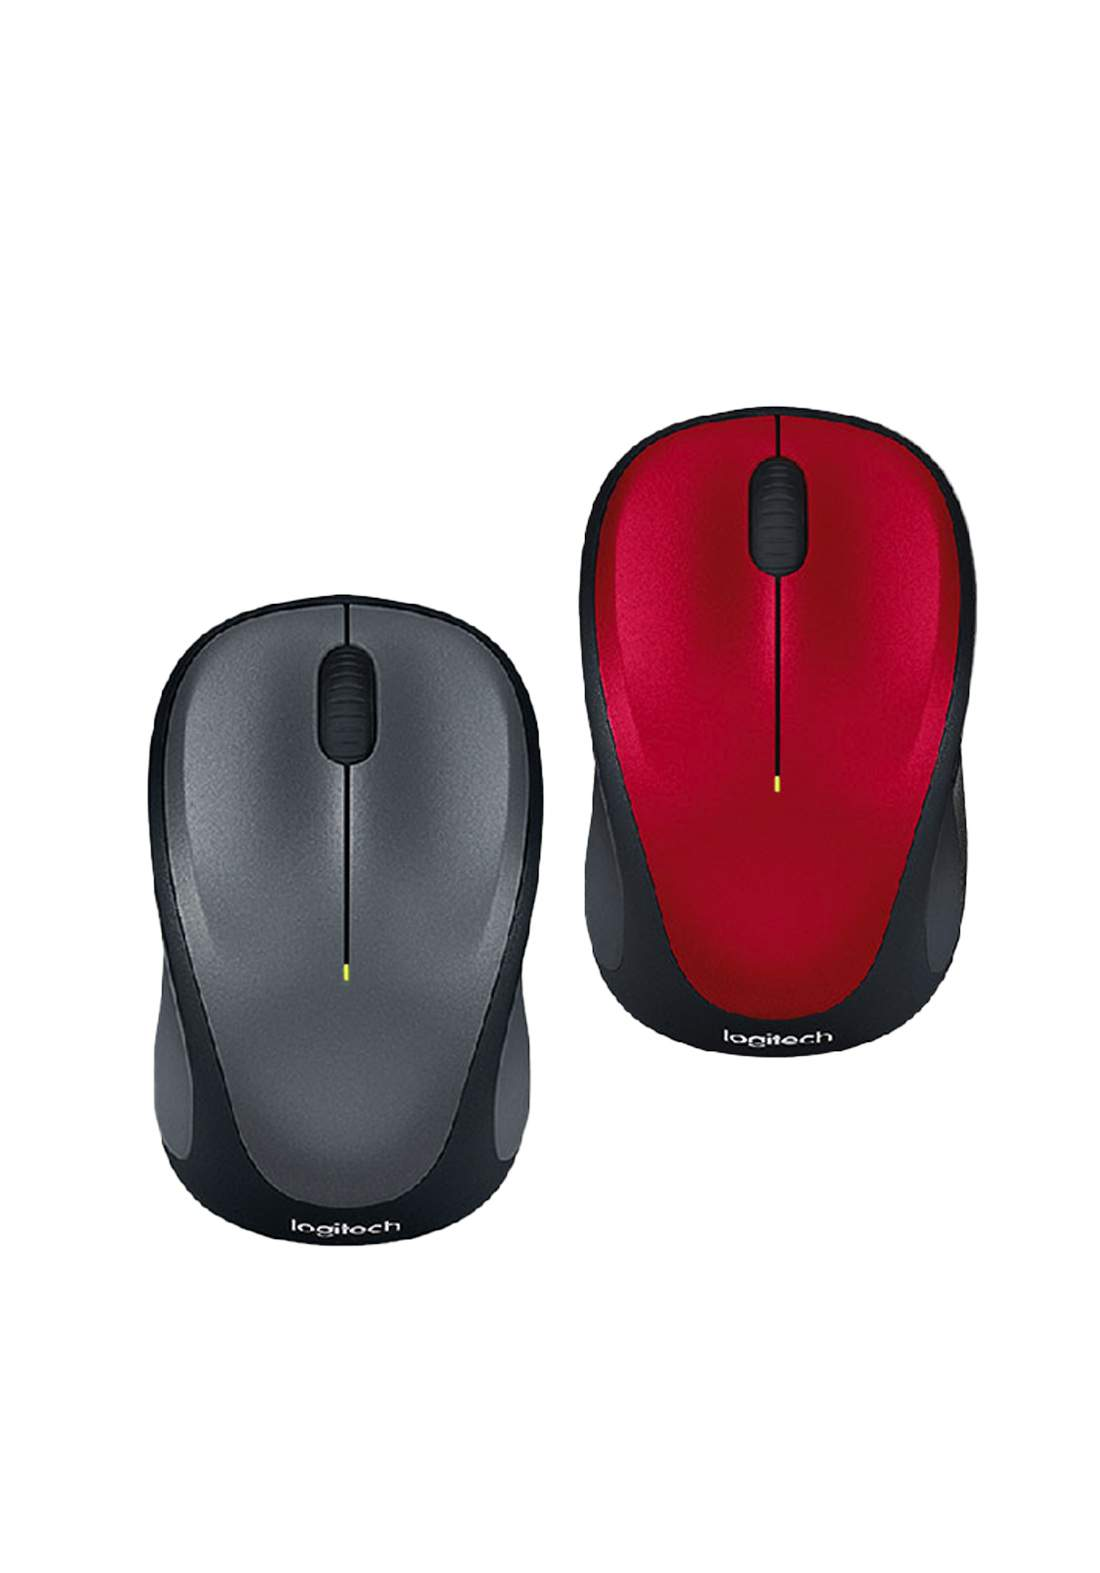 Logitech M235 Wireless Mouse ماوس